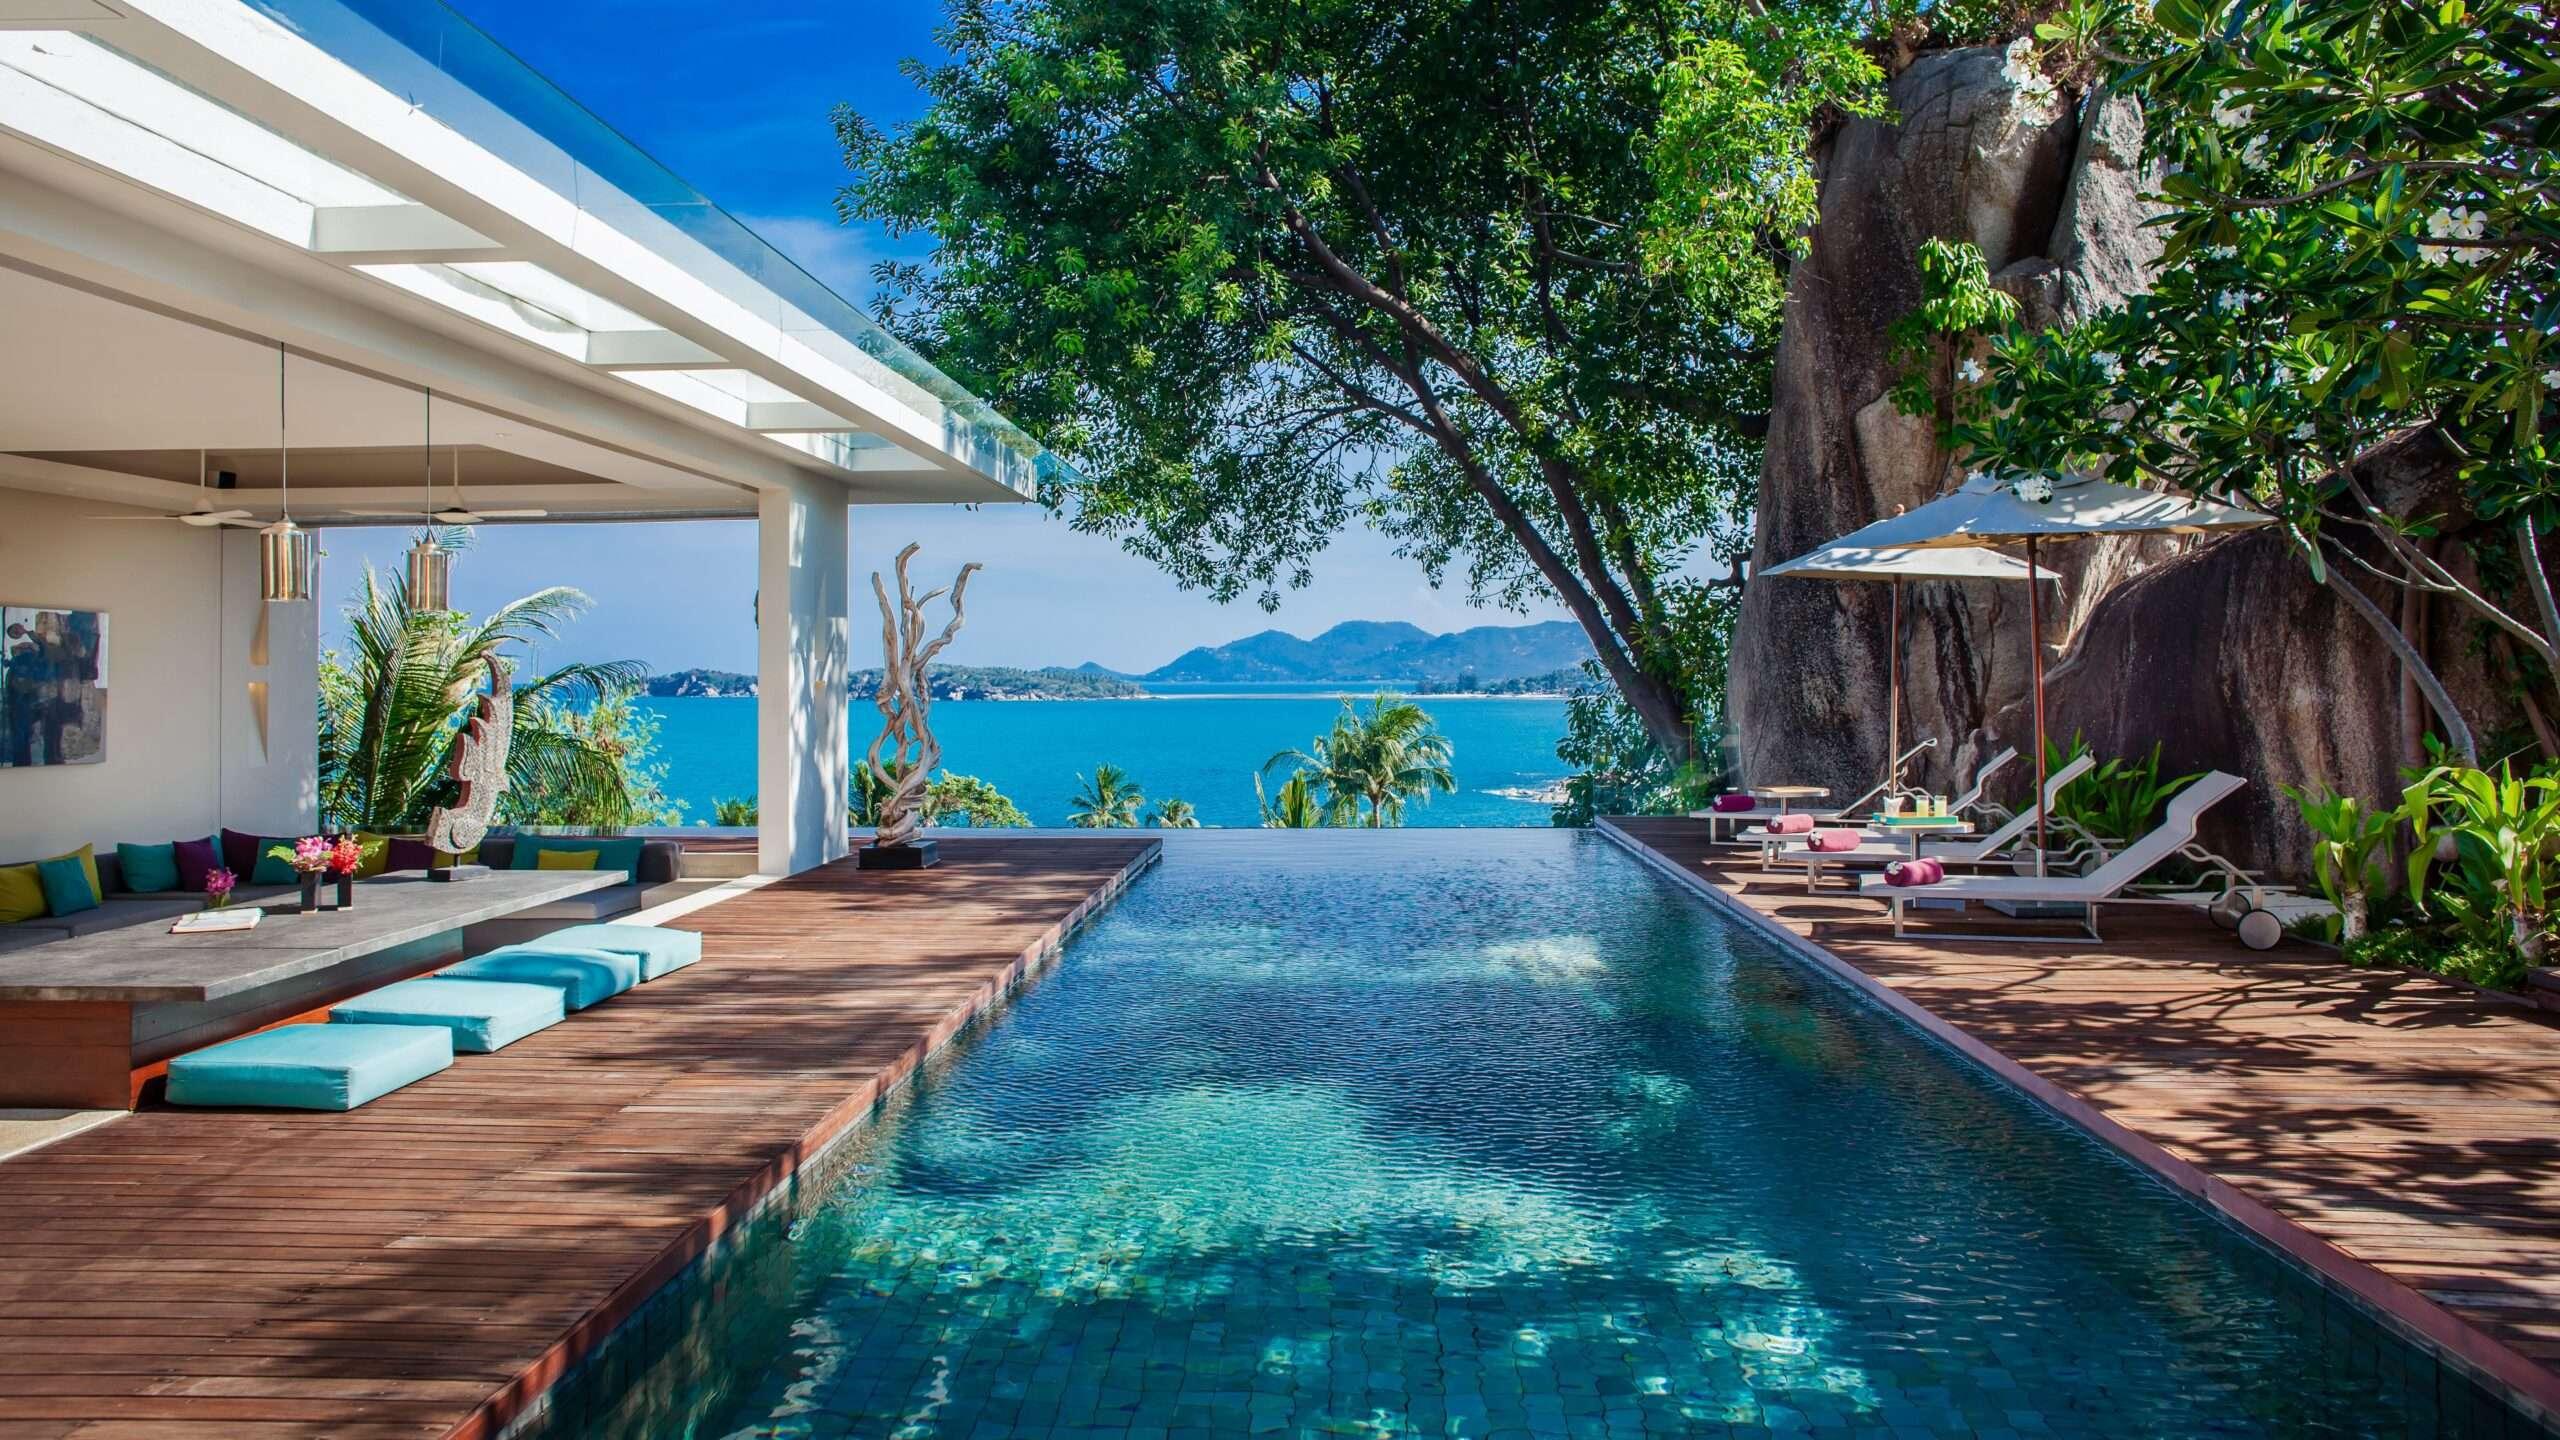 infinity swimming pool overlooking the sea at Villa Hin Koh Samui